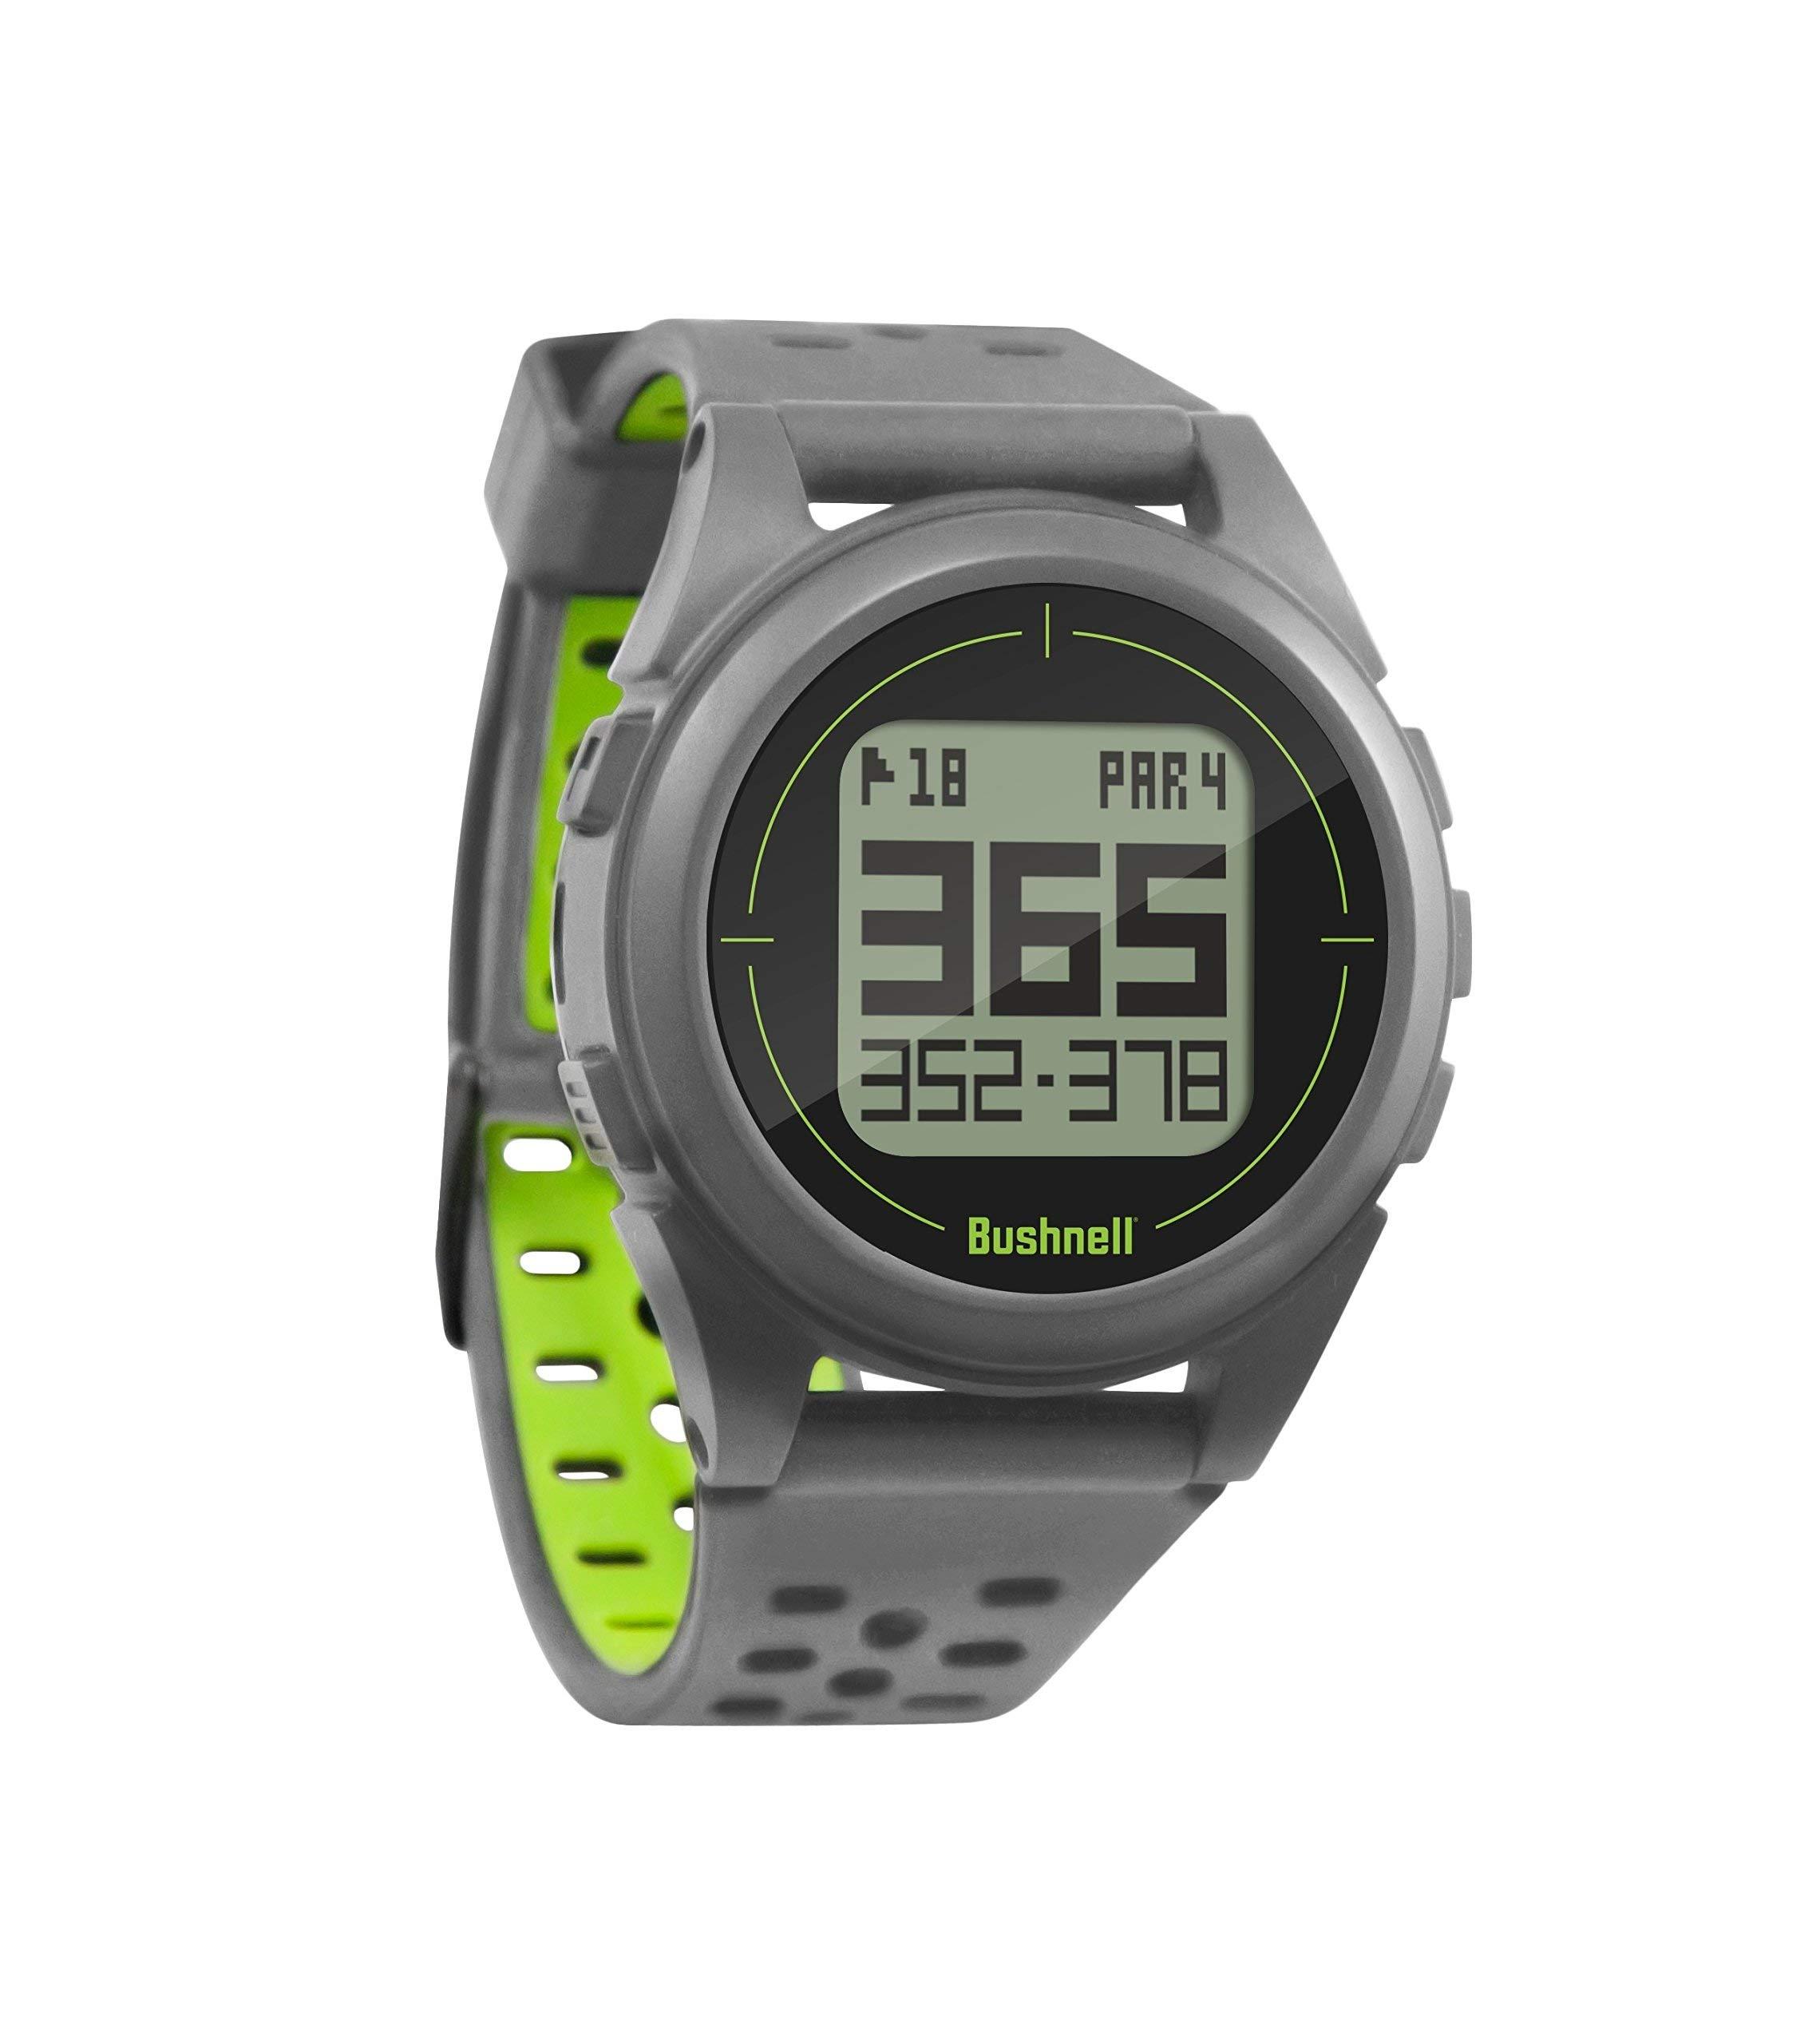 Bushnell Neo Ion 2 Golf GPS Watch, Silver/Green (Renewed)